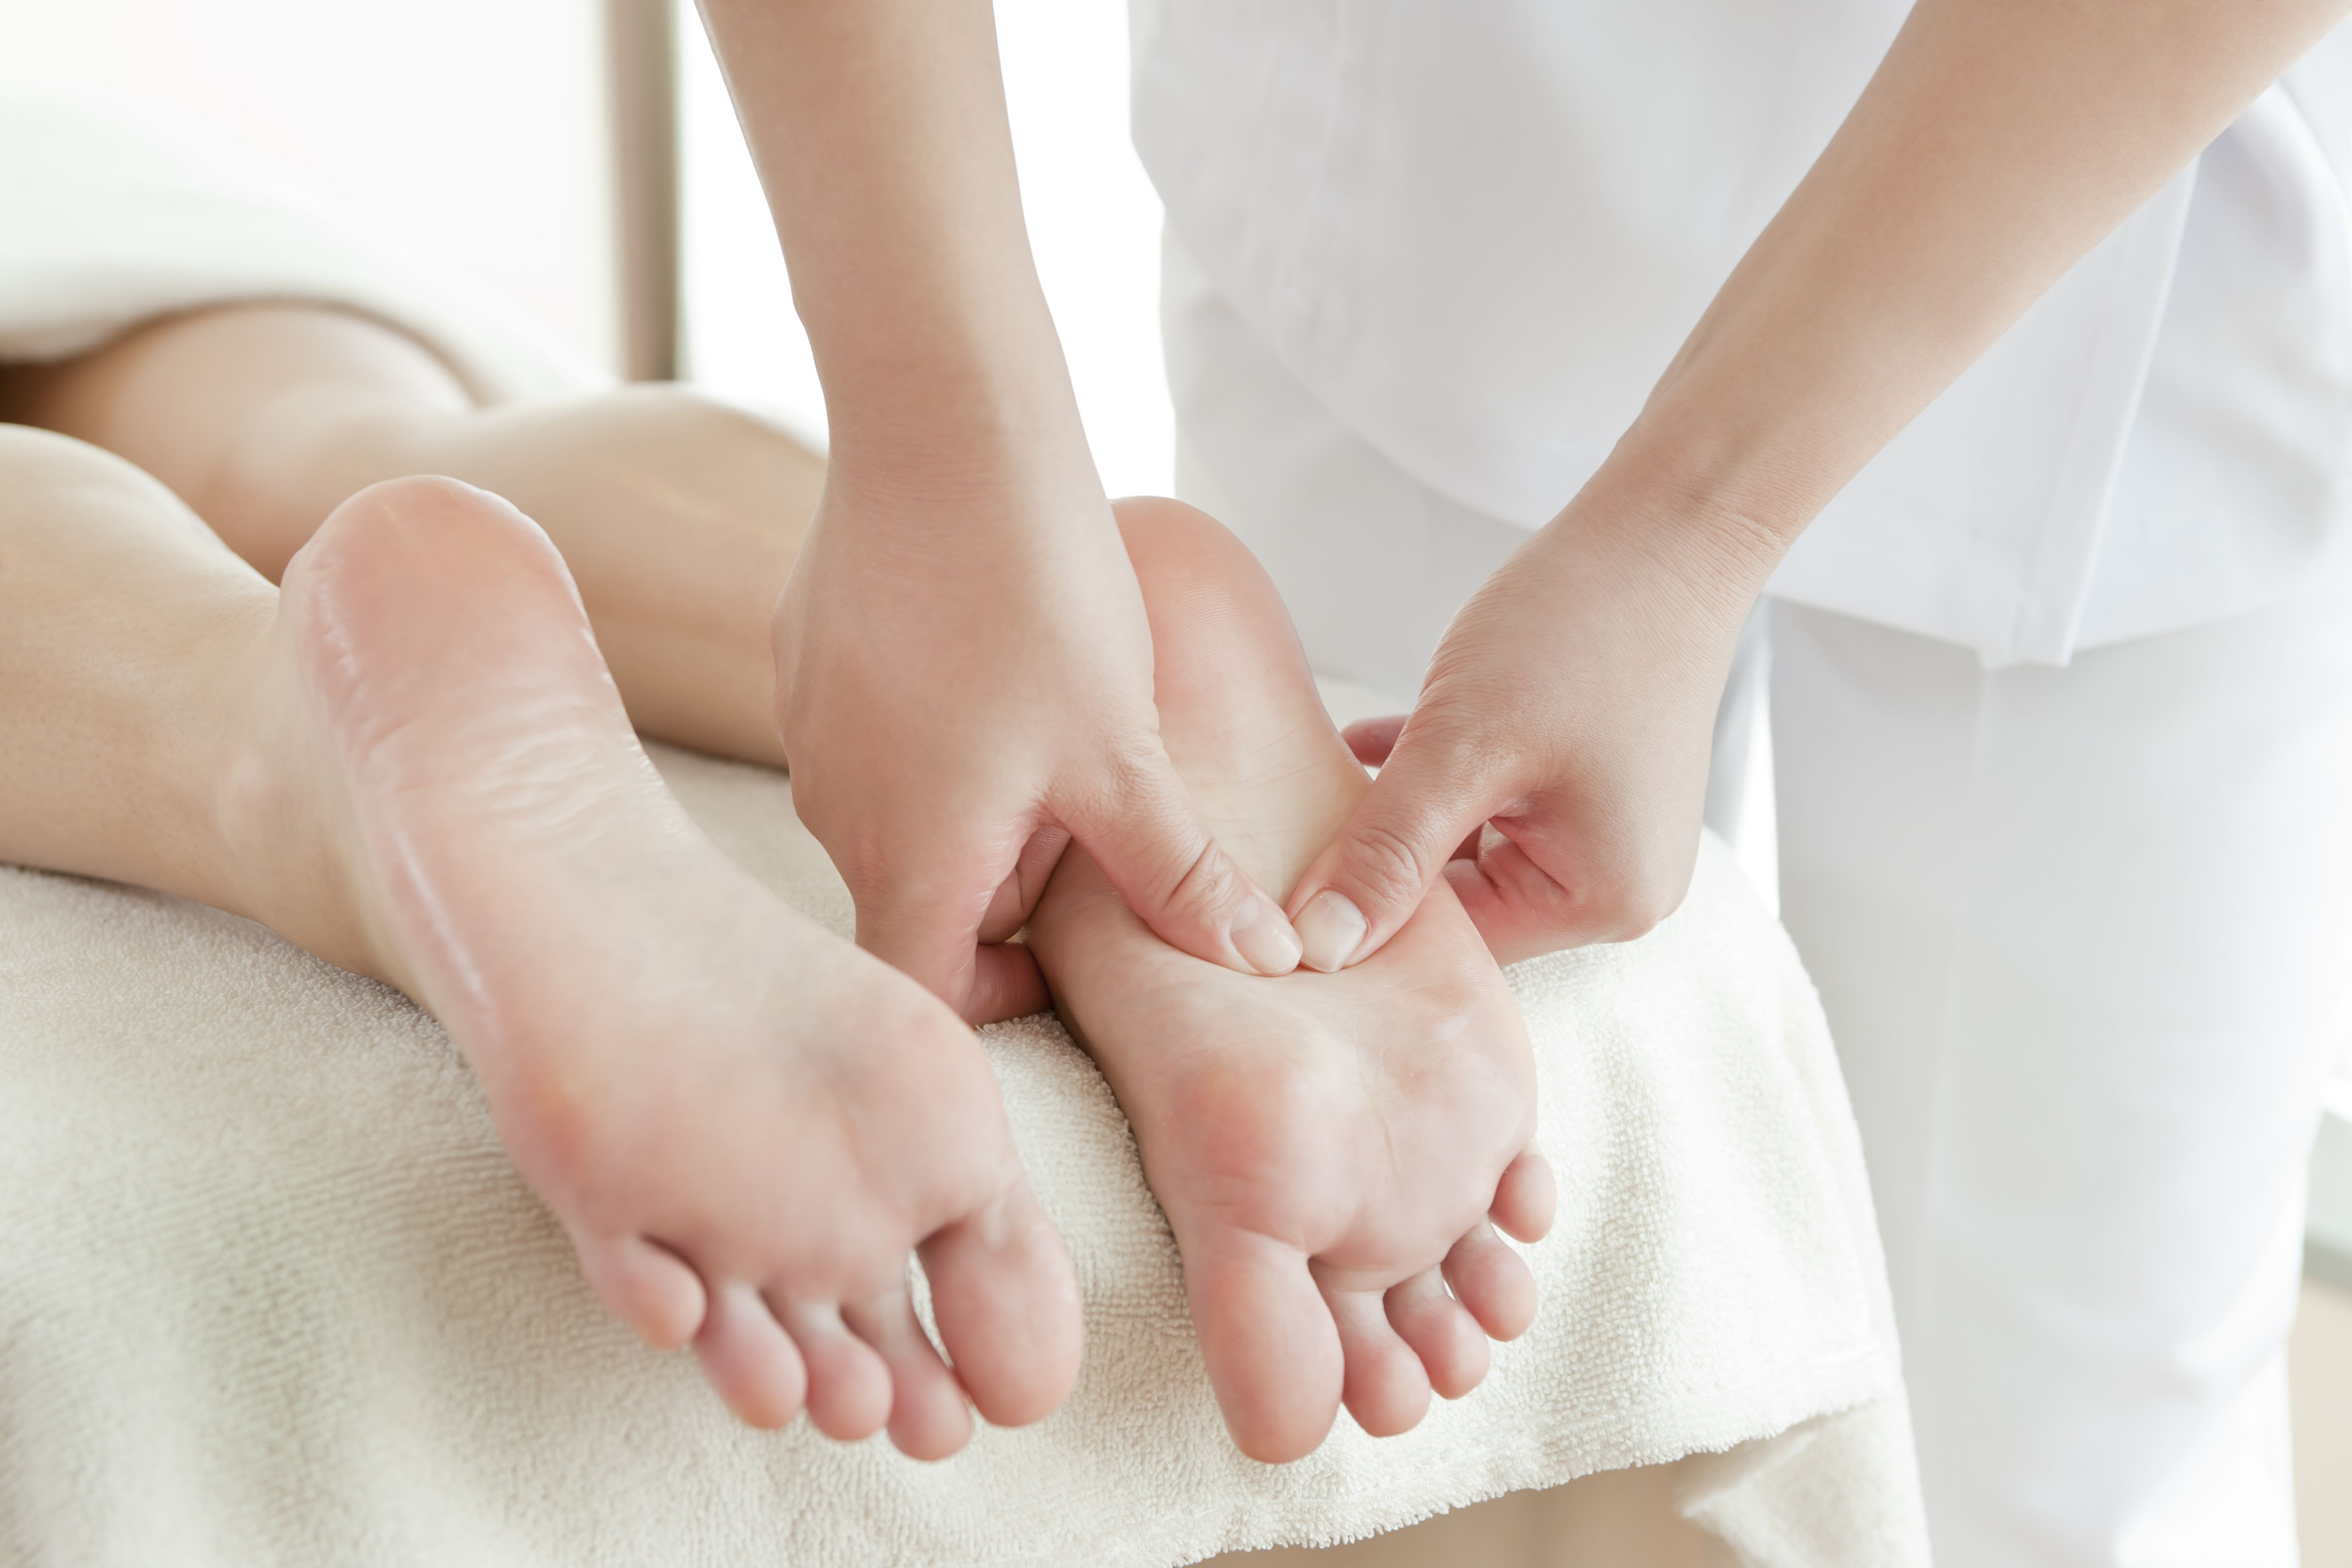 Reflexología podal: Tratamientos de Kieromasaje